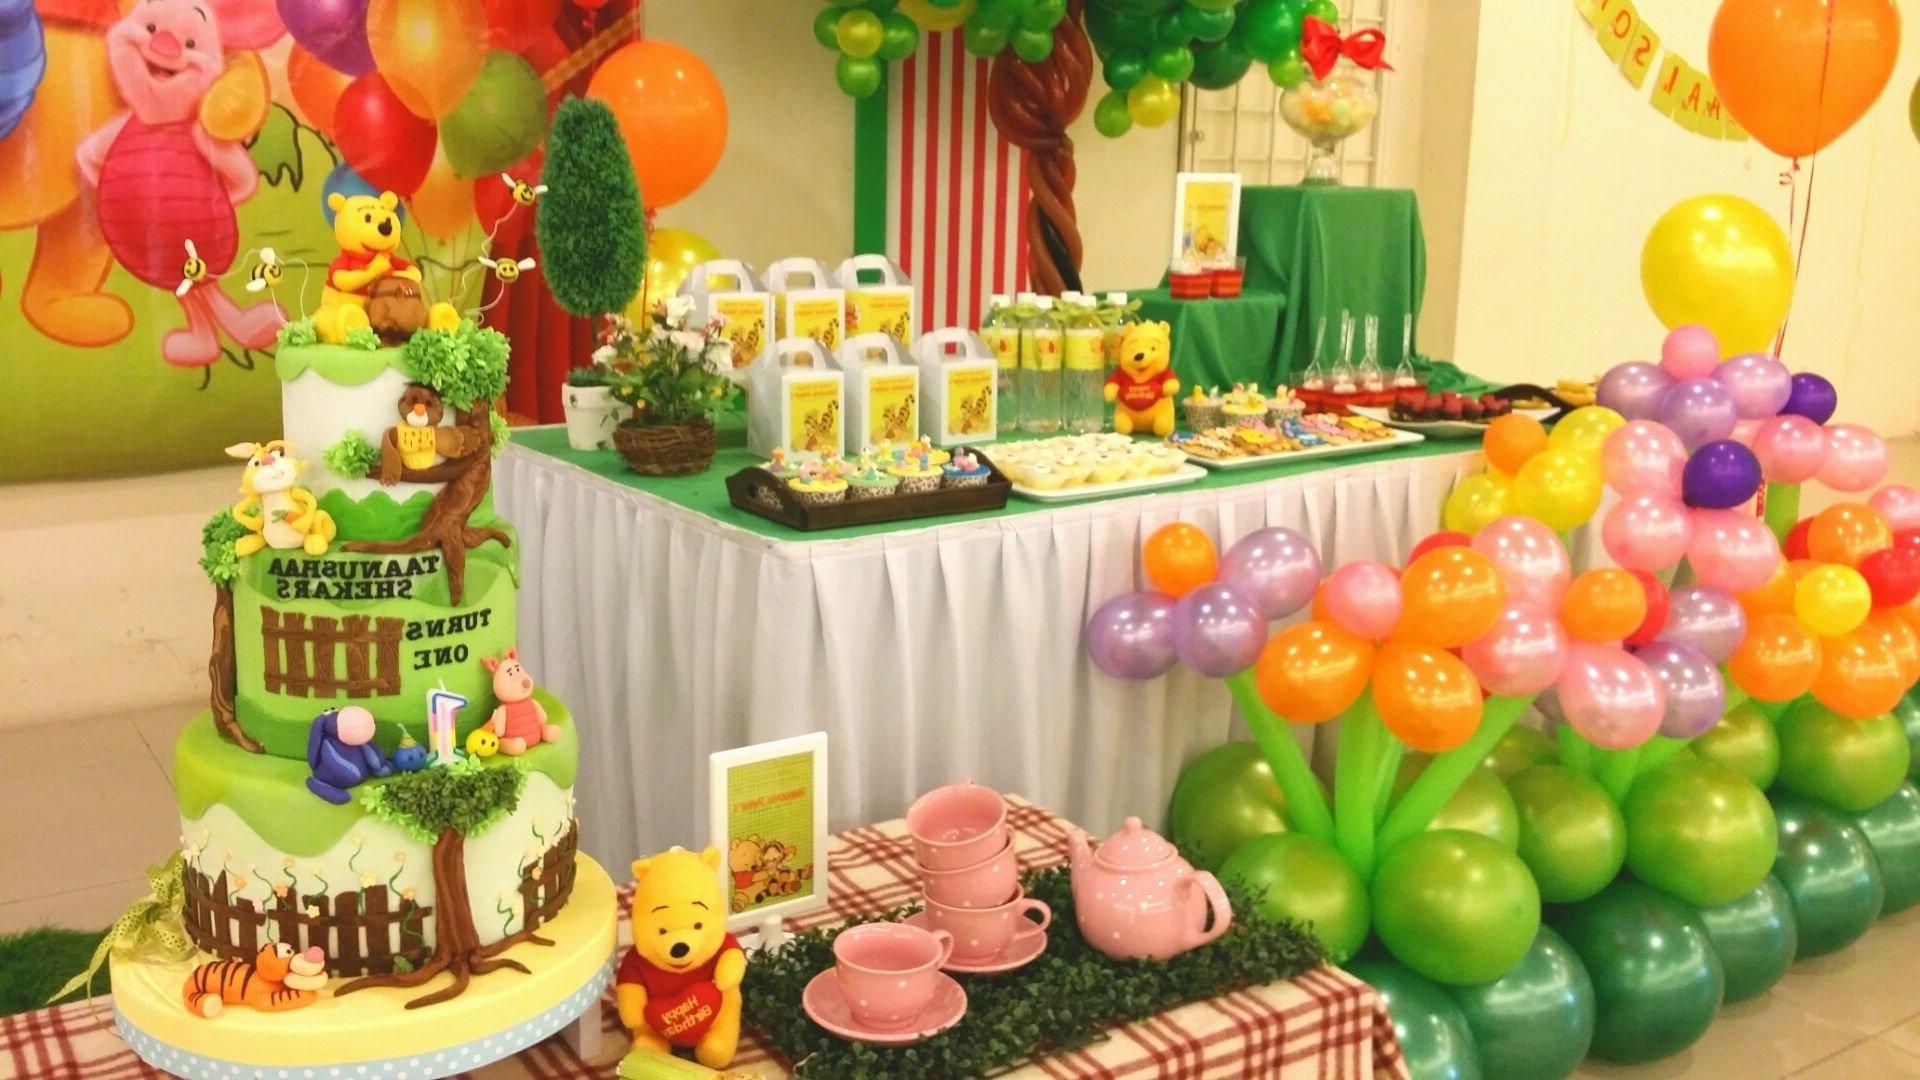 10 Pretty Winnie The Pooh Birthday Party Ideas winnie the pooh 5th birthday party banner decorating of party ideas